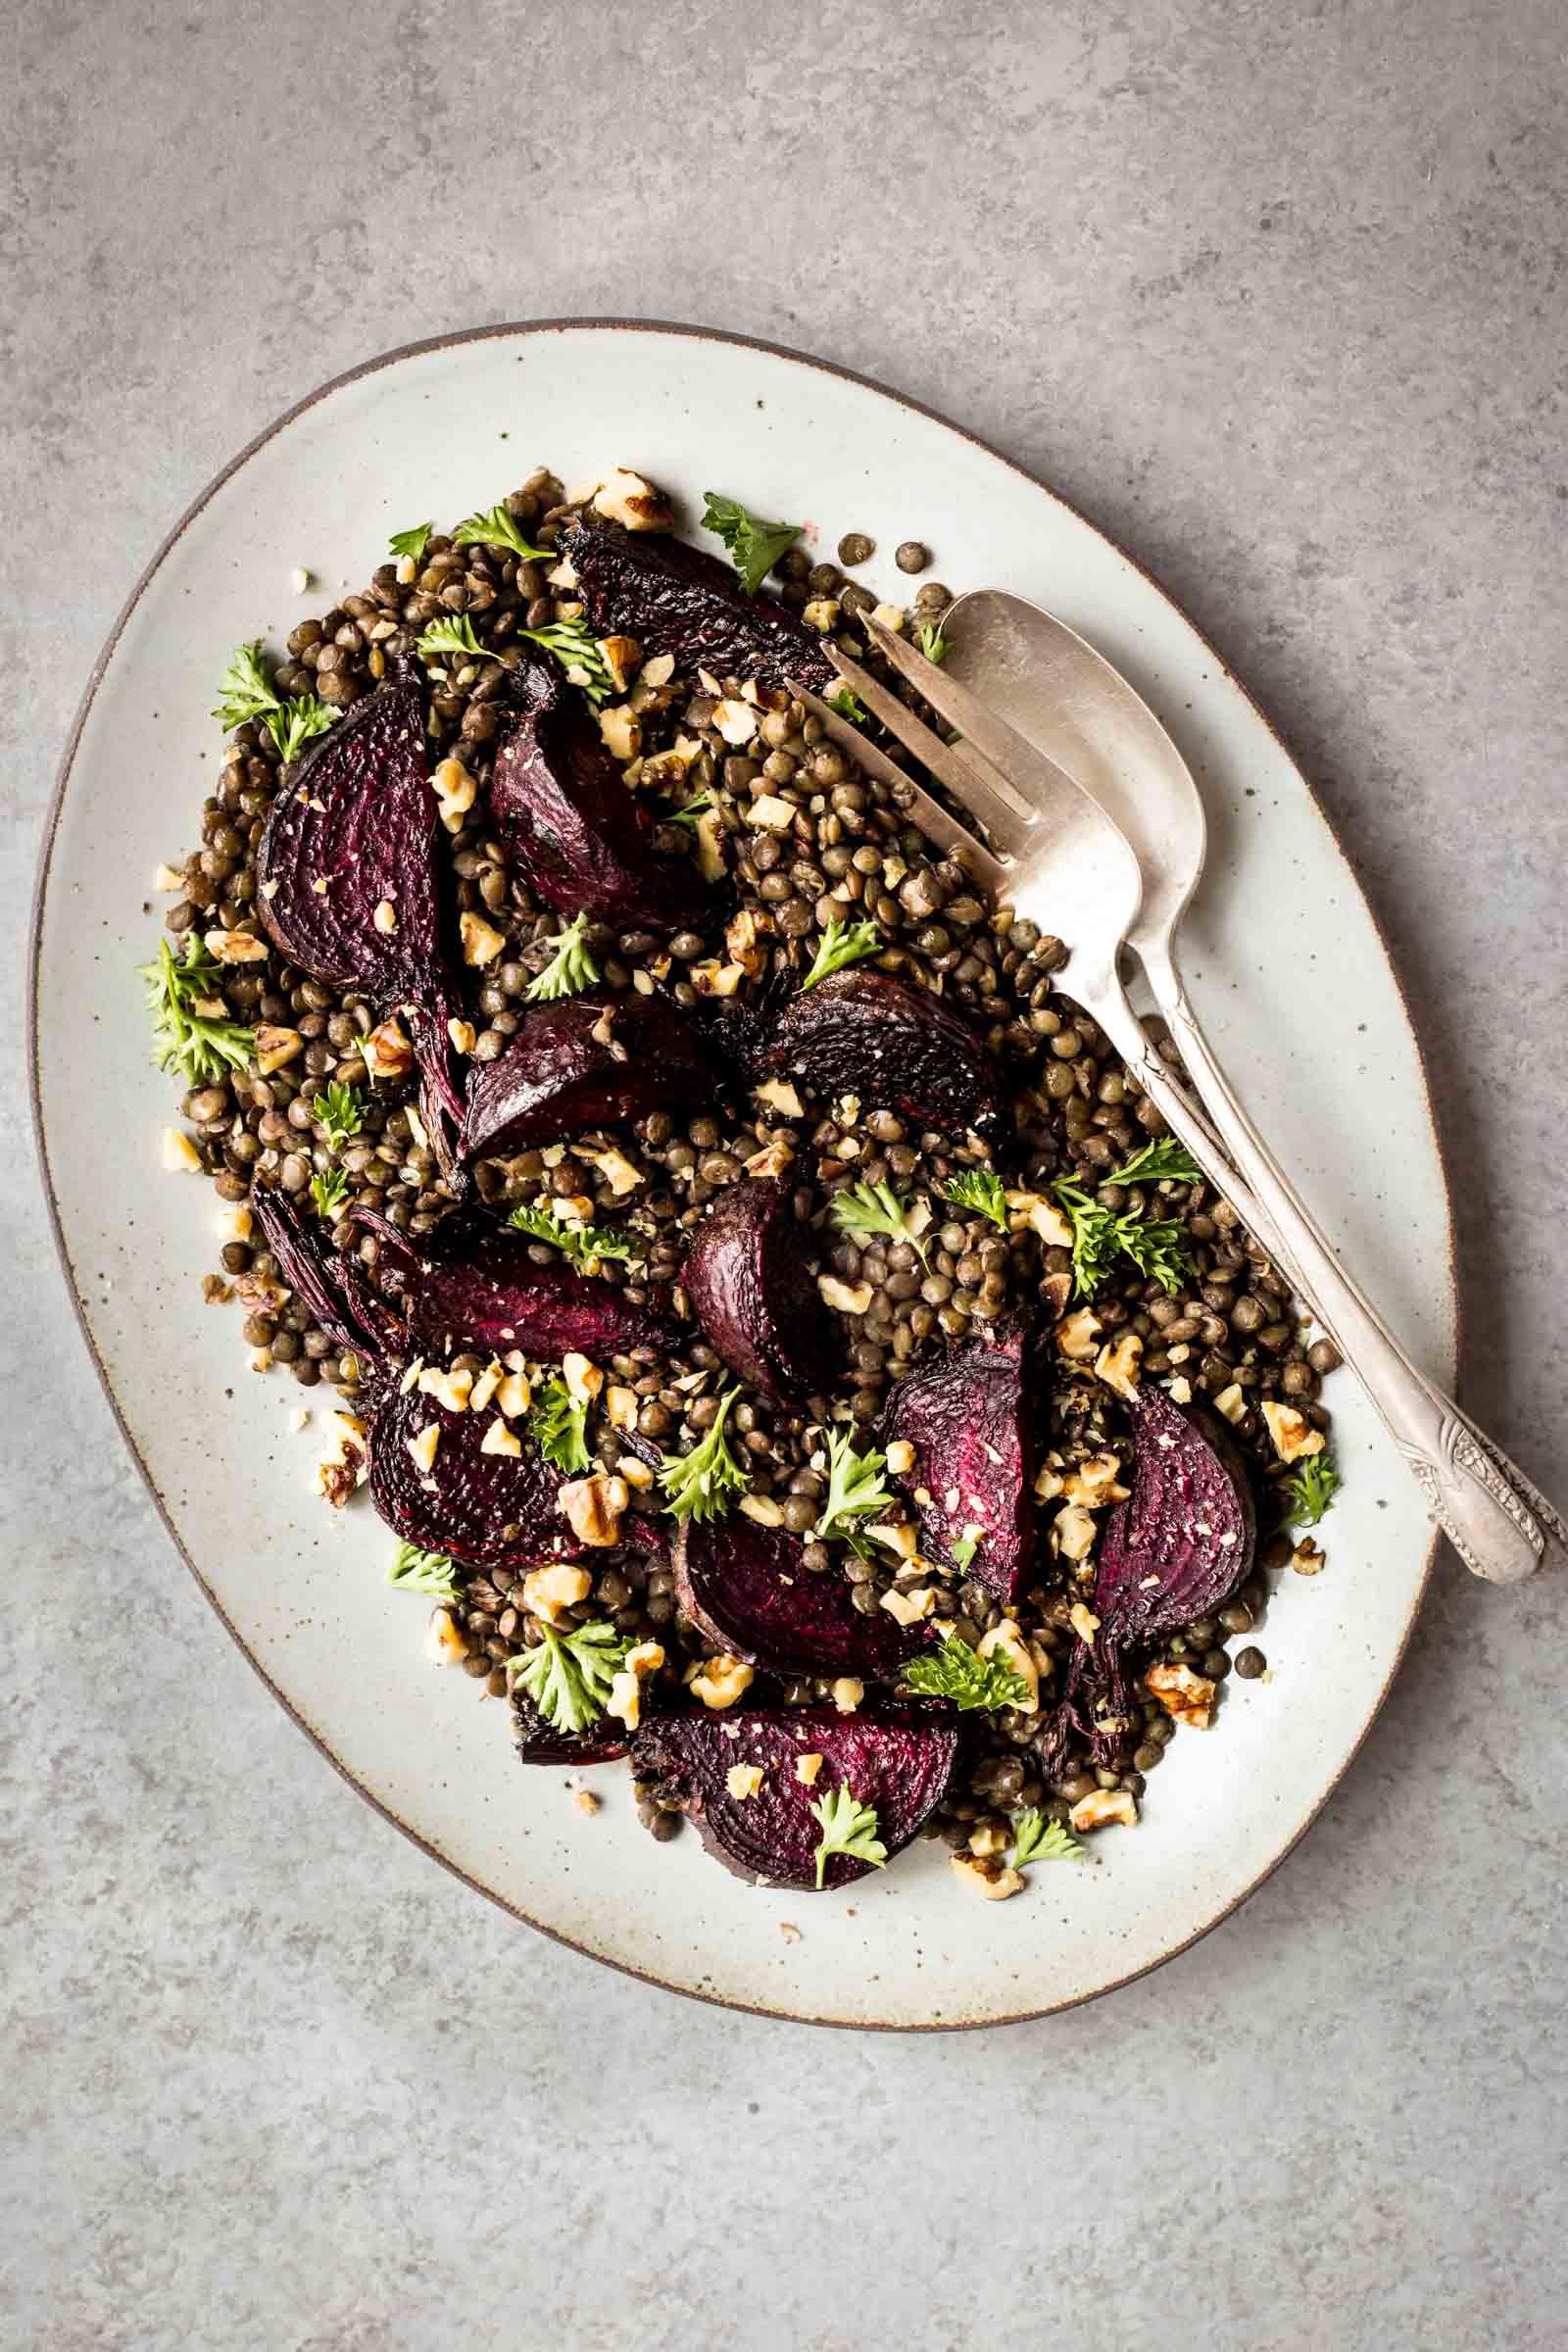 Beet & Walnut Lentil Salad